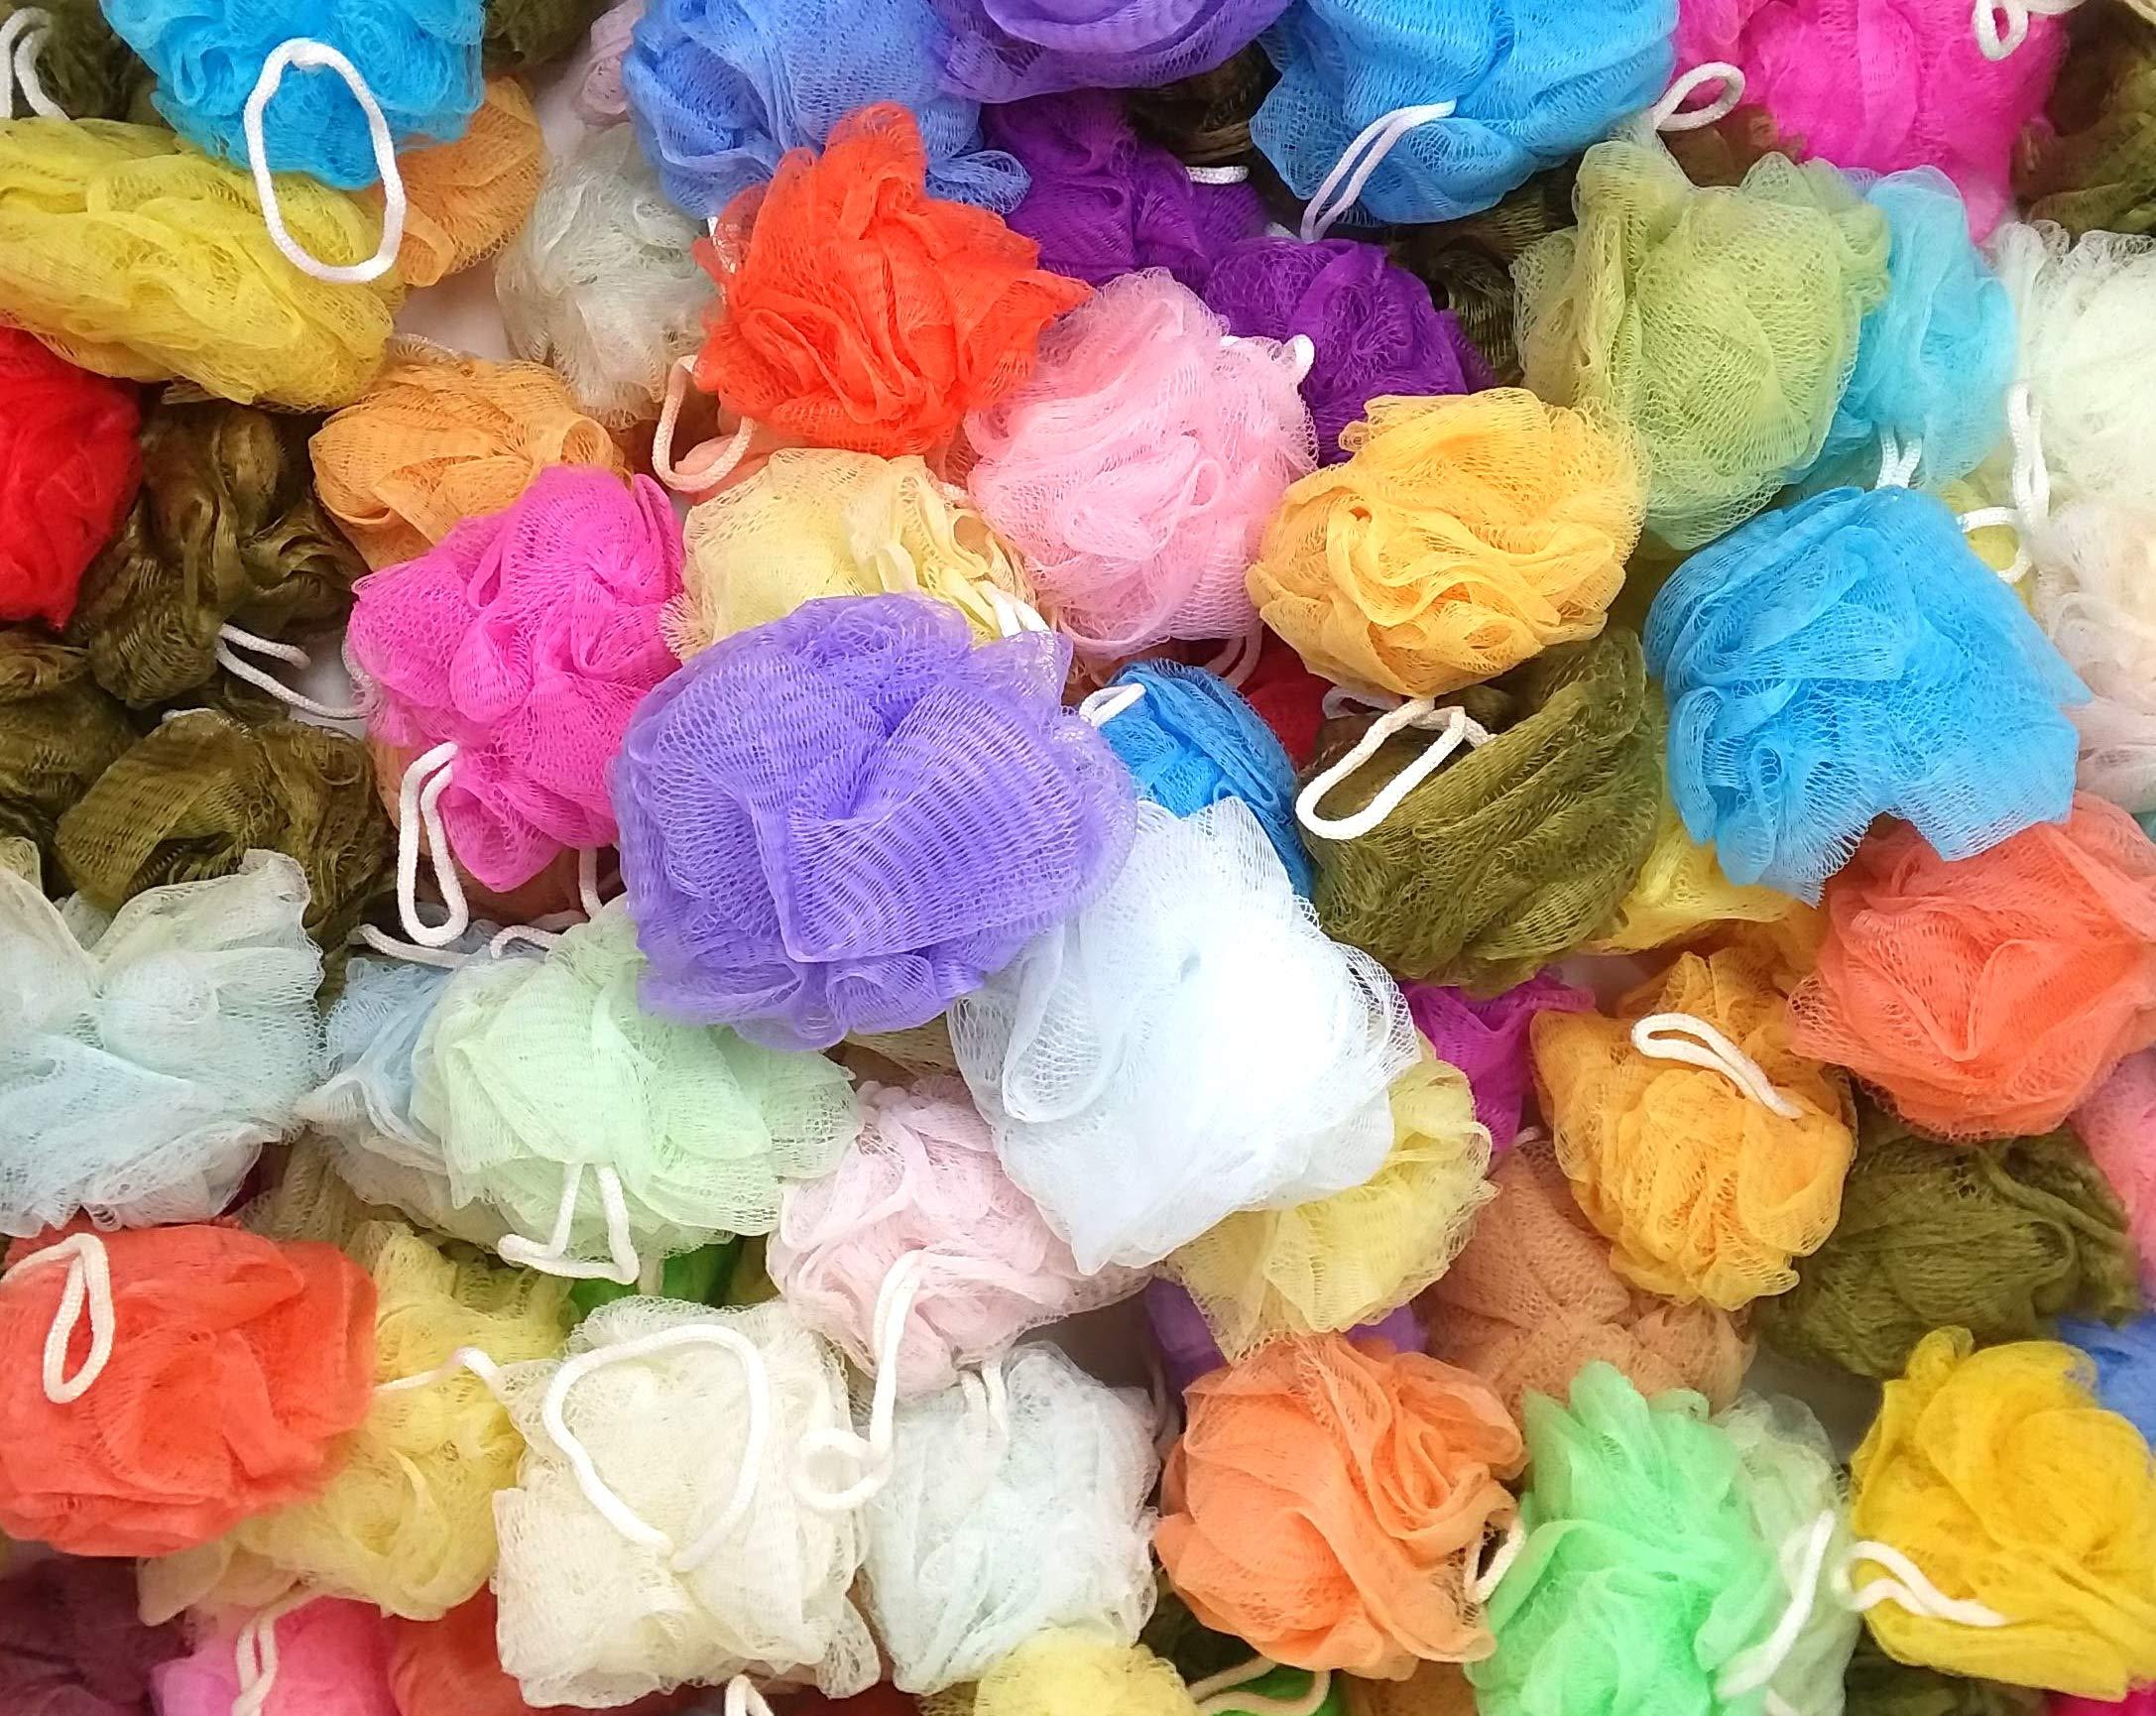 Loofah Lord 96 Bath or Shower Sponge Loofahs Pouf Mesh Assorted Colors Wholesale Bulk Lot by Loofah Lord